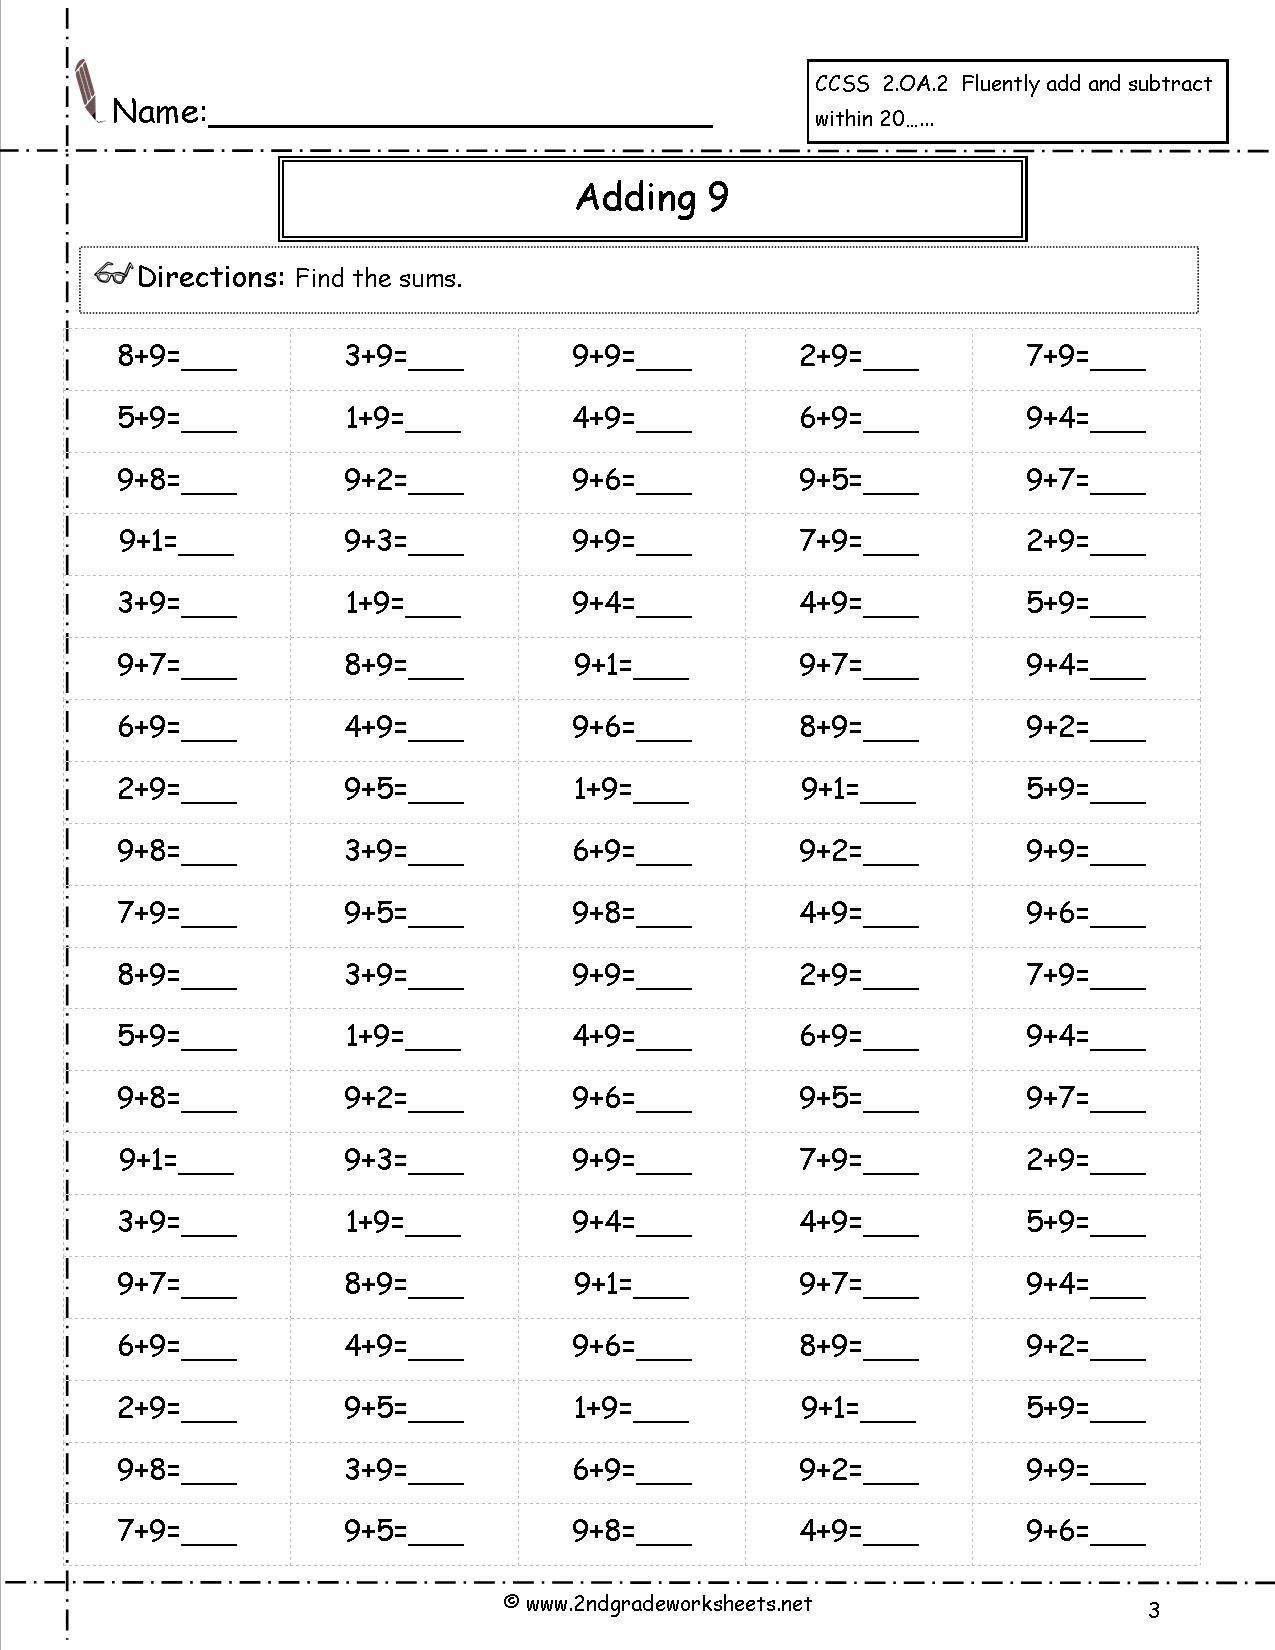 Adding 9 worksheet   1st grade math [ 1650 x 1275 Pixel ]